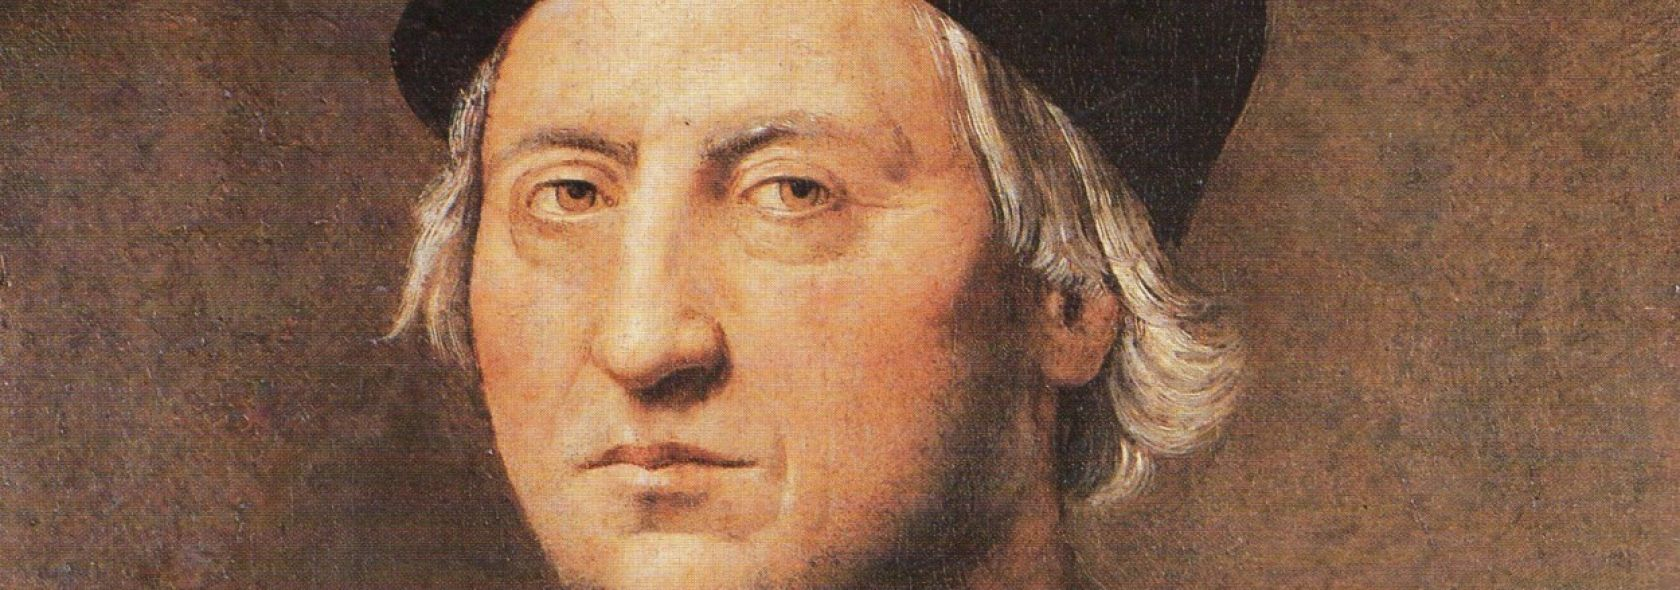 Ridolfo Bigordi del Ghirlandaio (attr.) - Portrait de Christophe Colomb - 1520